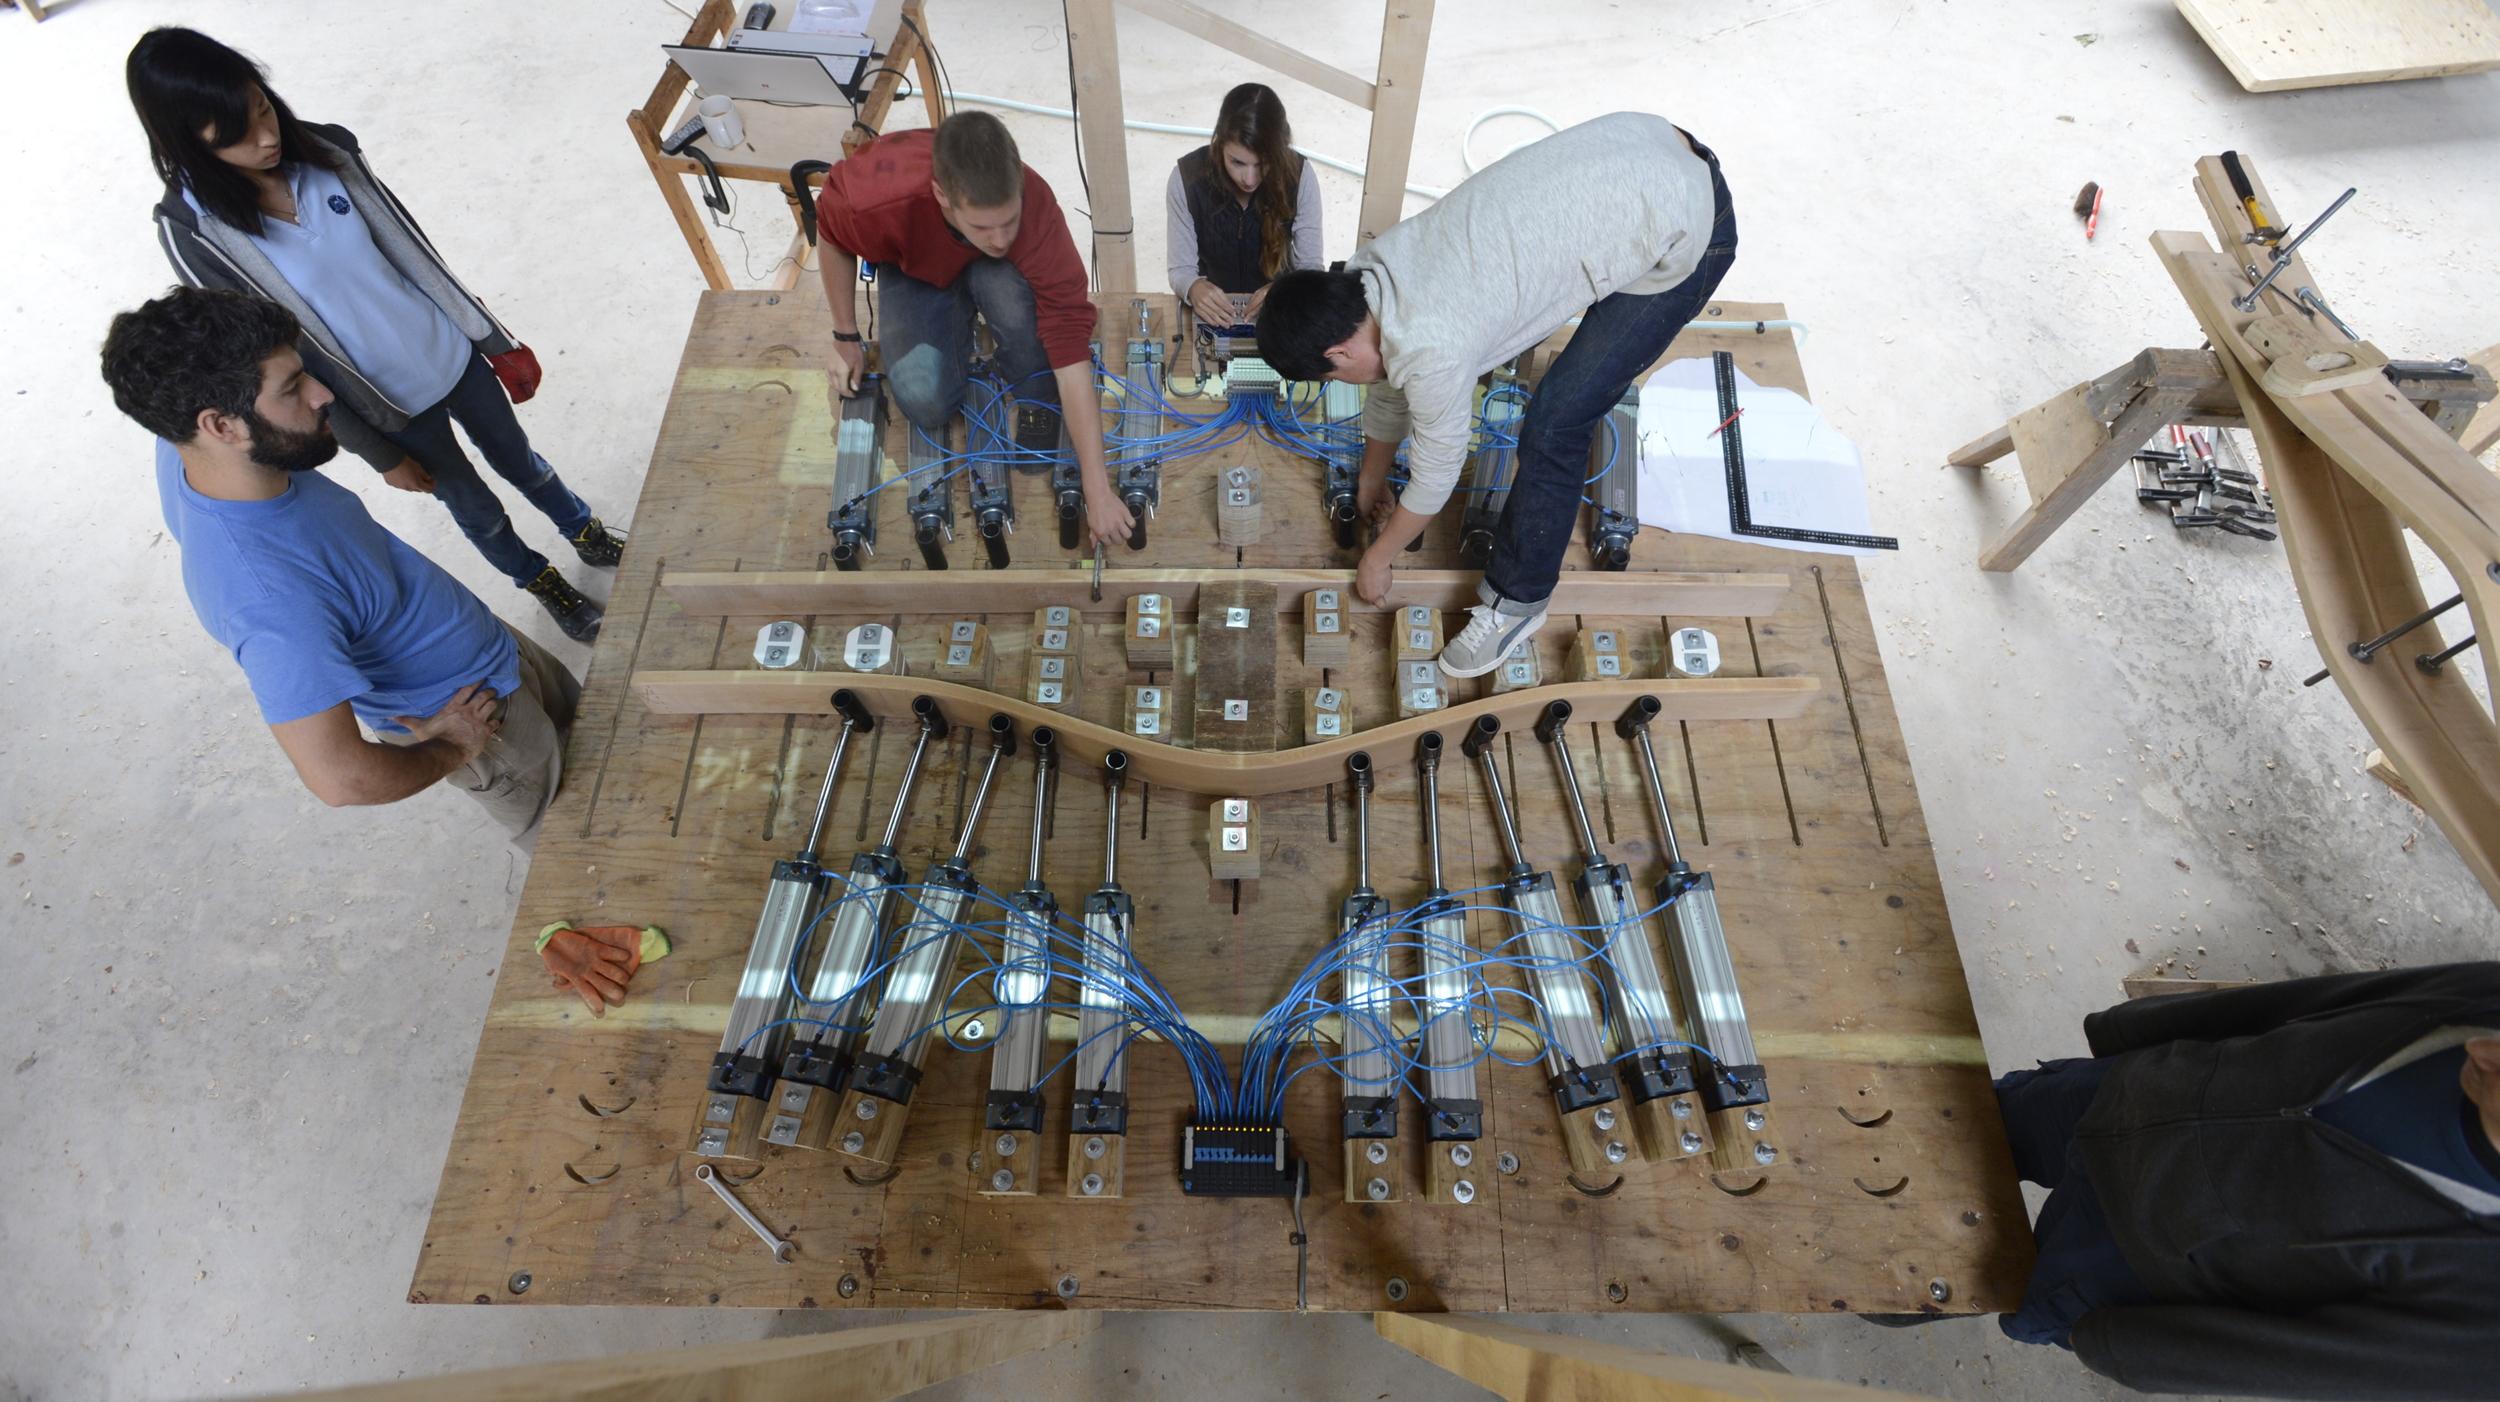 Hooke_Park_Design_&_Make_Timber_Seasoning_Shelter_bending_wood_on_the_jig_VB_2013_07_29_0040.JPG